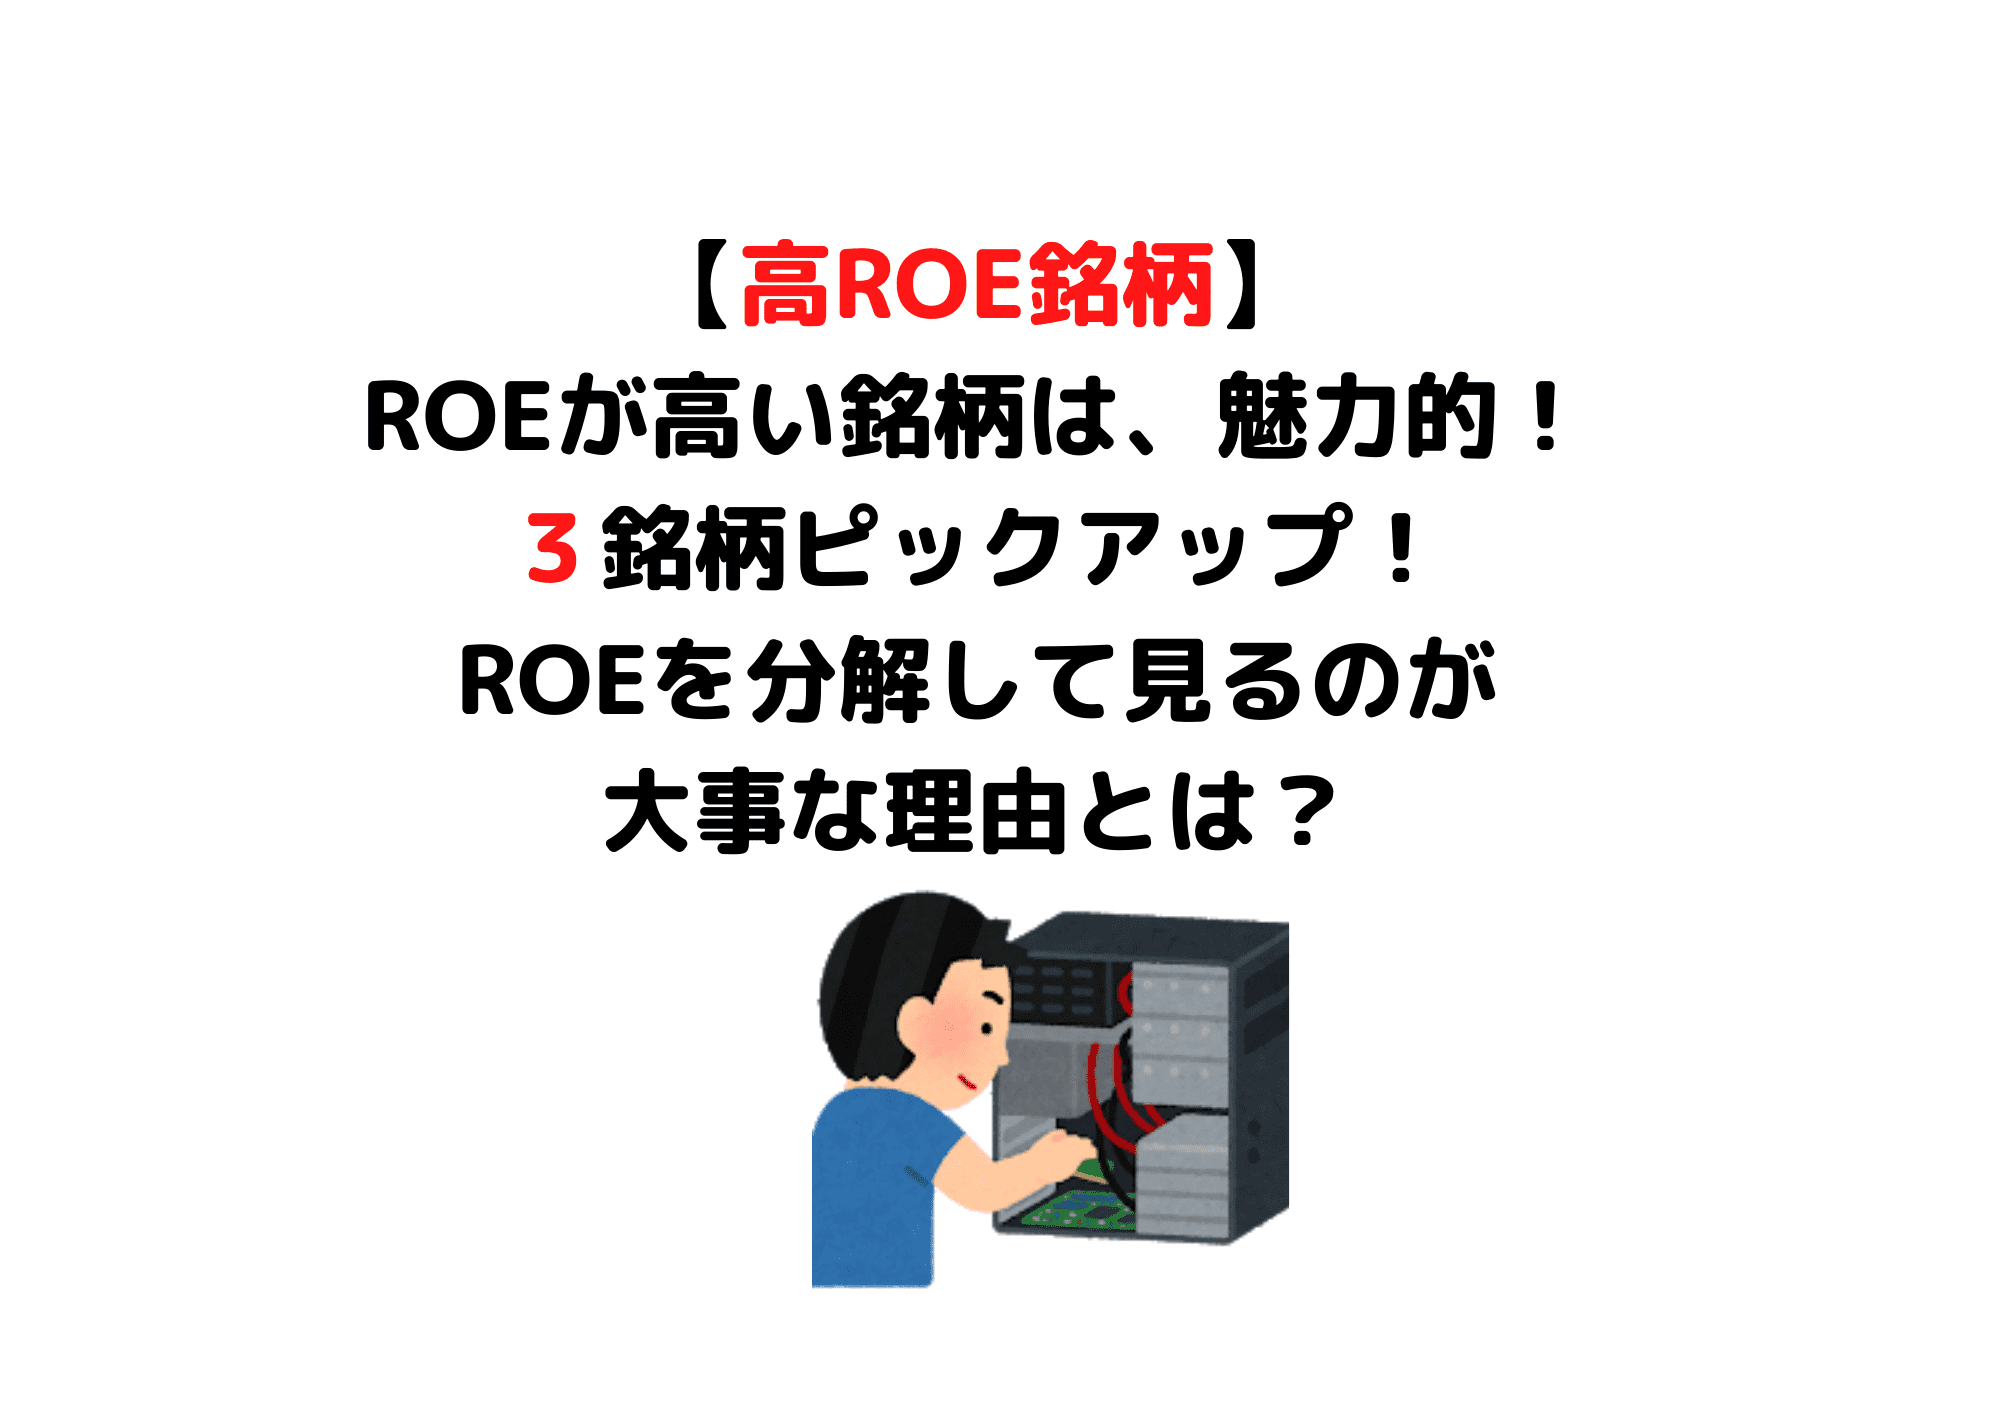 ROE 分解